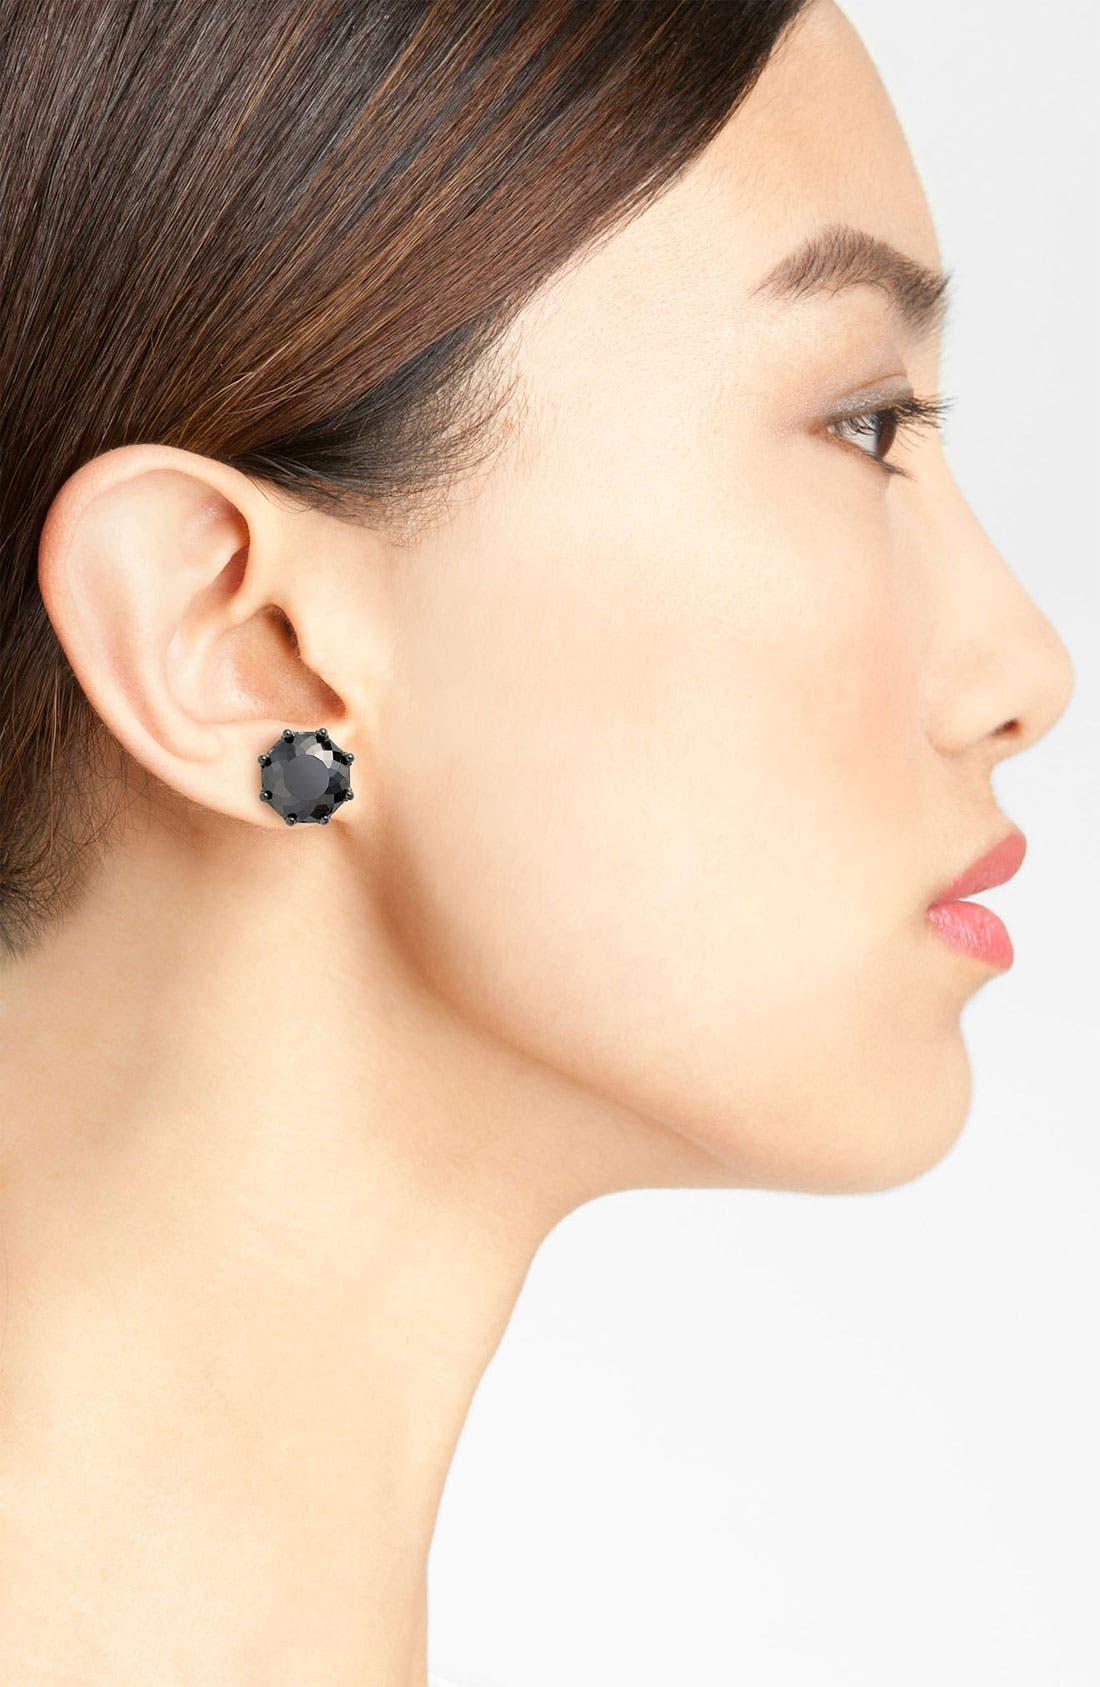 'Punk Rocks' Oversized Stud Earrings,                             Alternate thumbnail 2, color,                             001